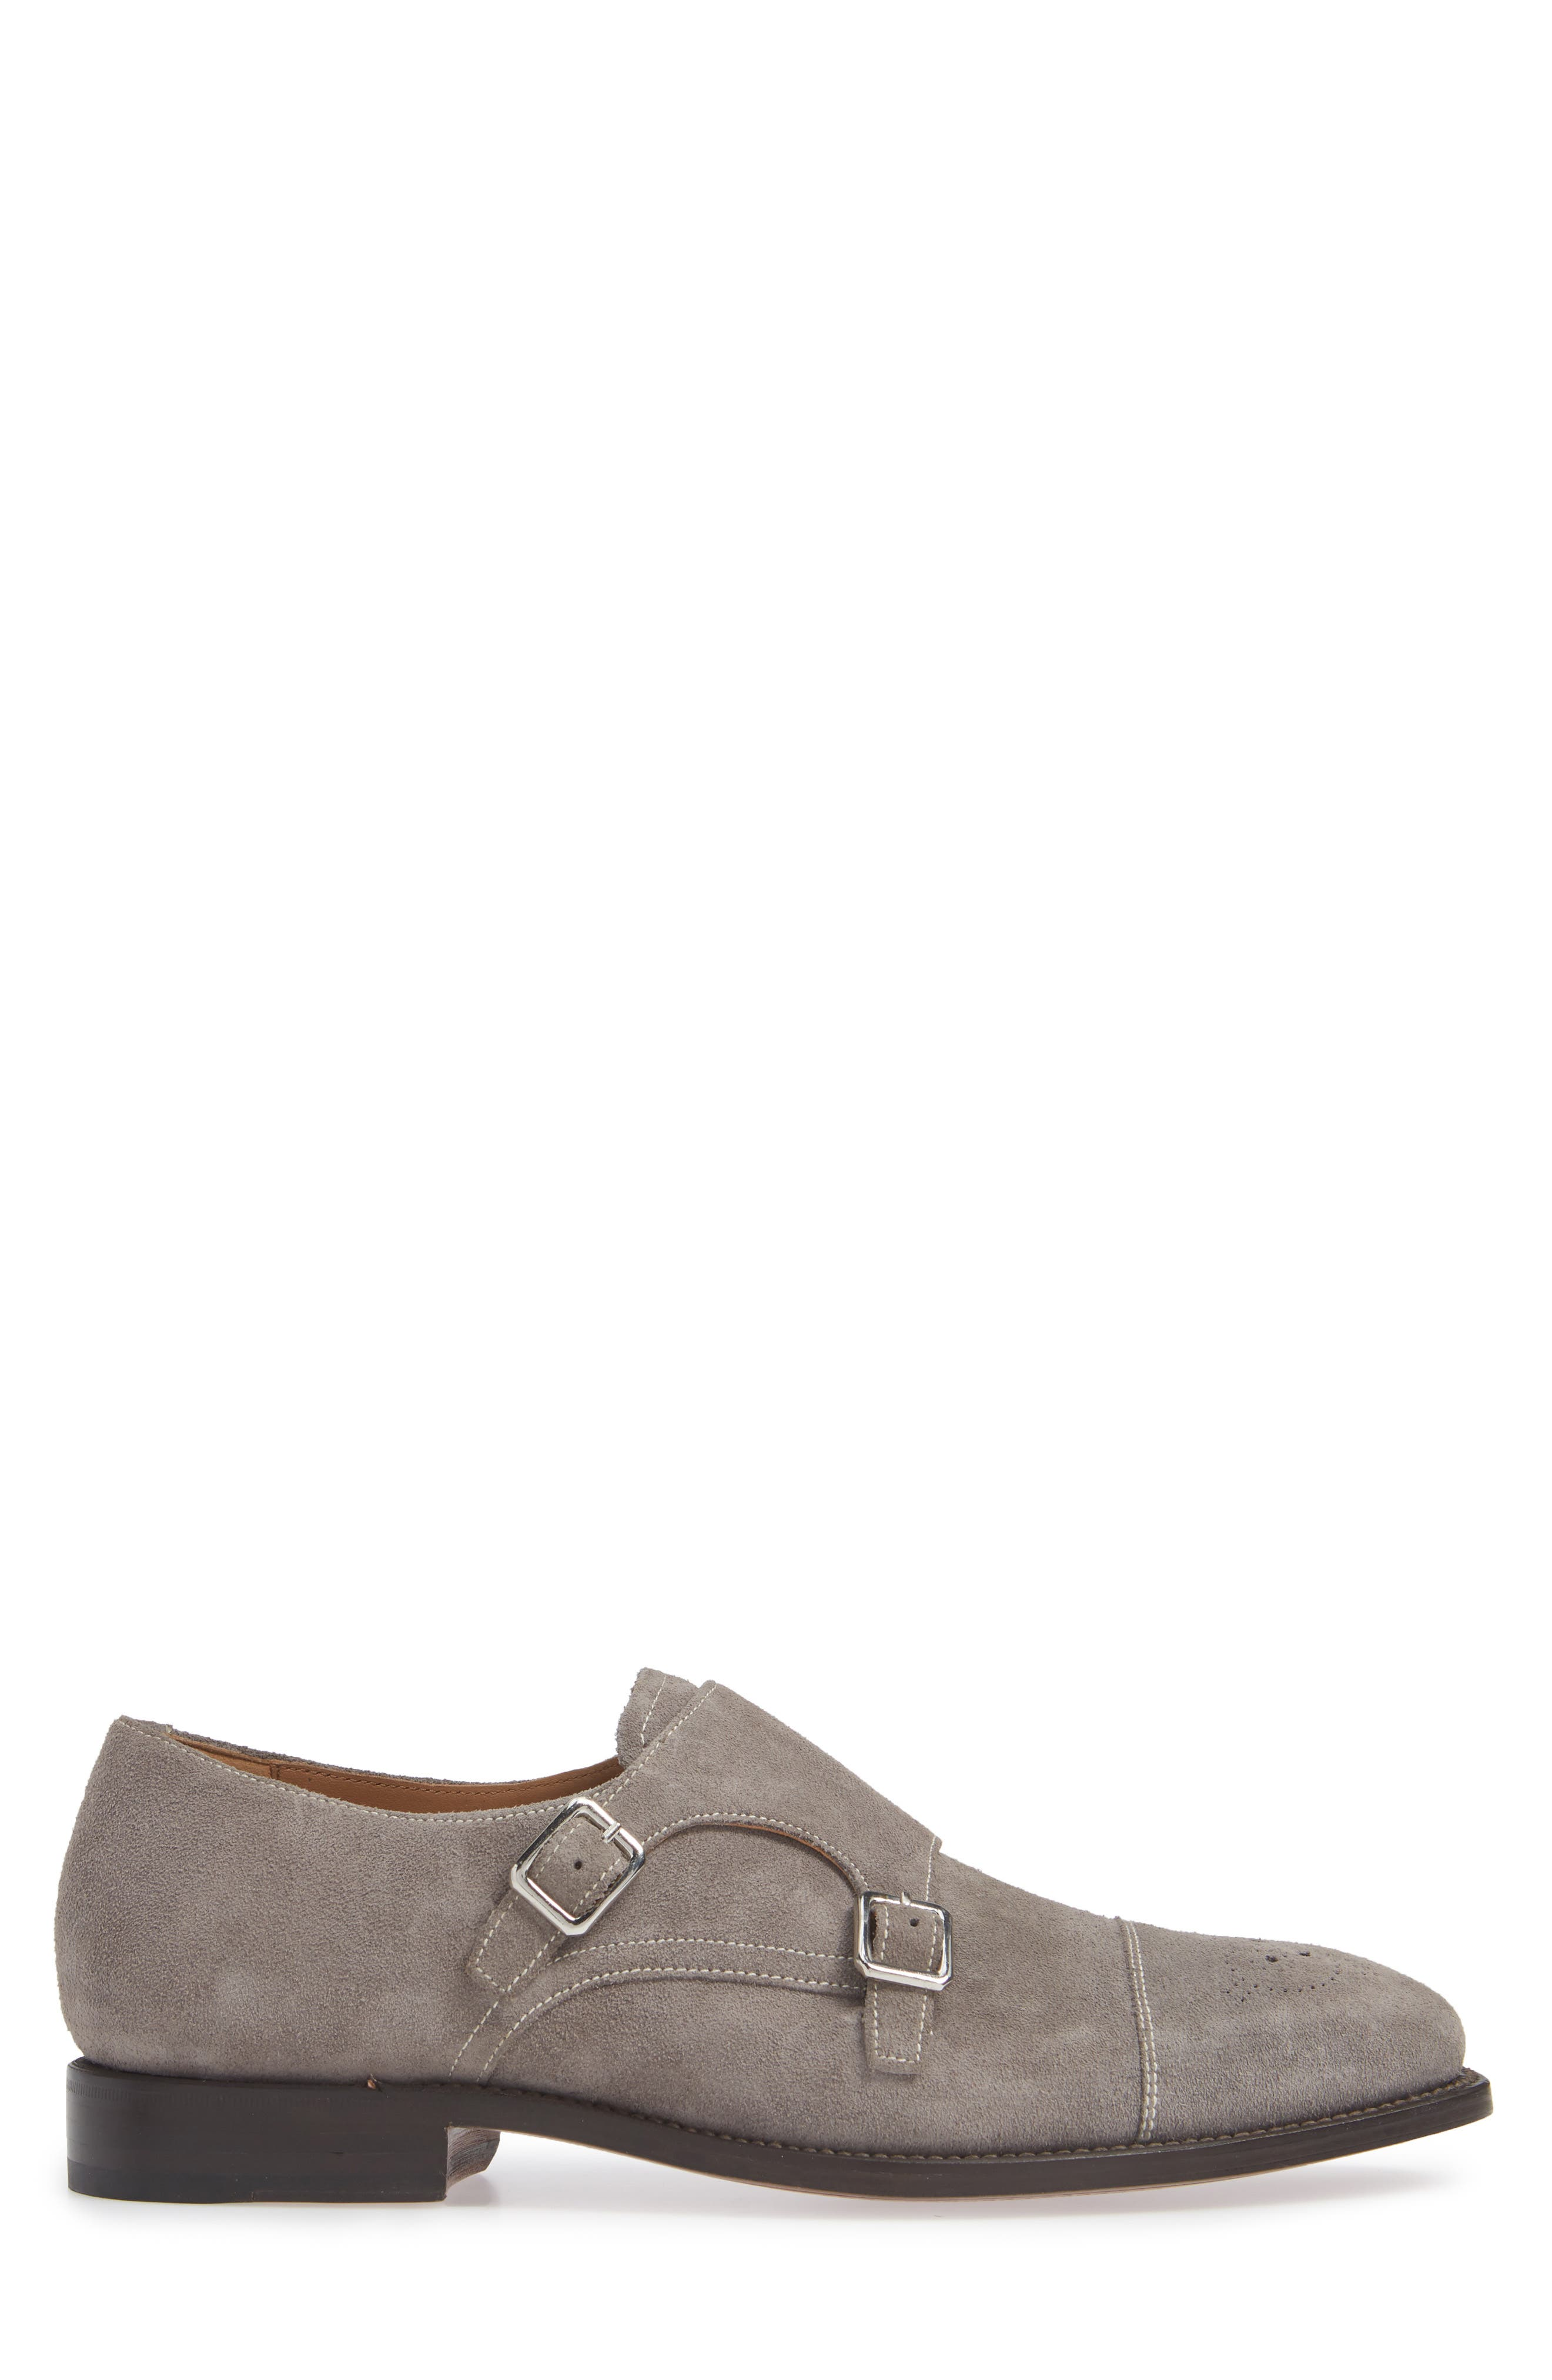 Sausalito Double Monk Strap Shoe,                             Alternate thumbnail 3, color,                             GREY SUEDE